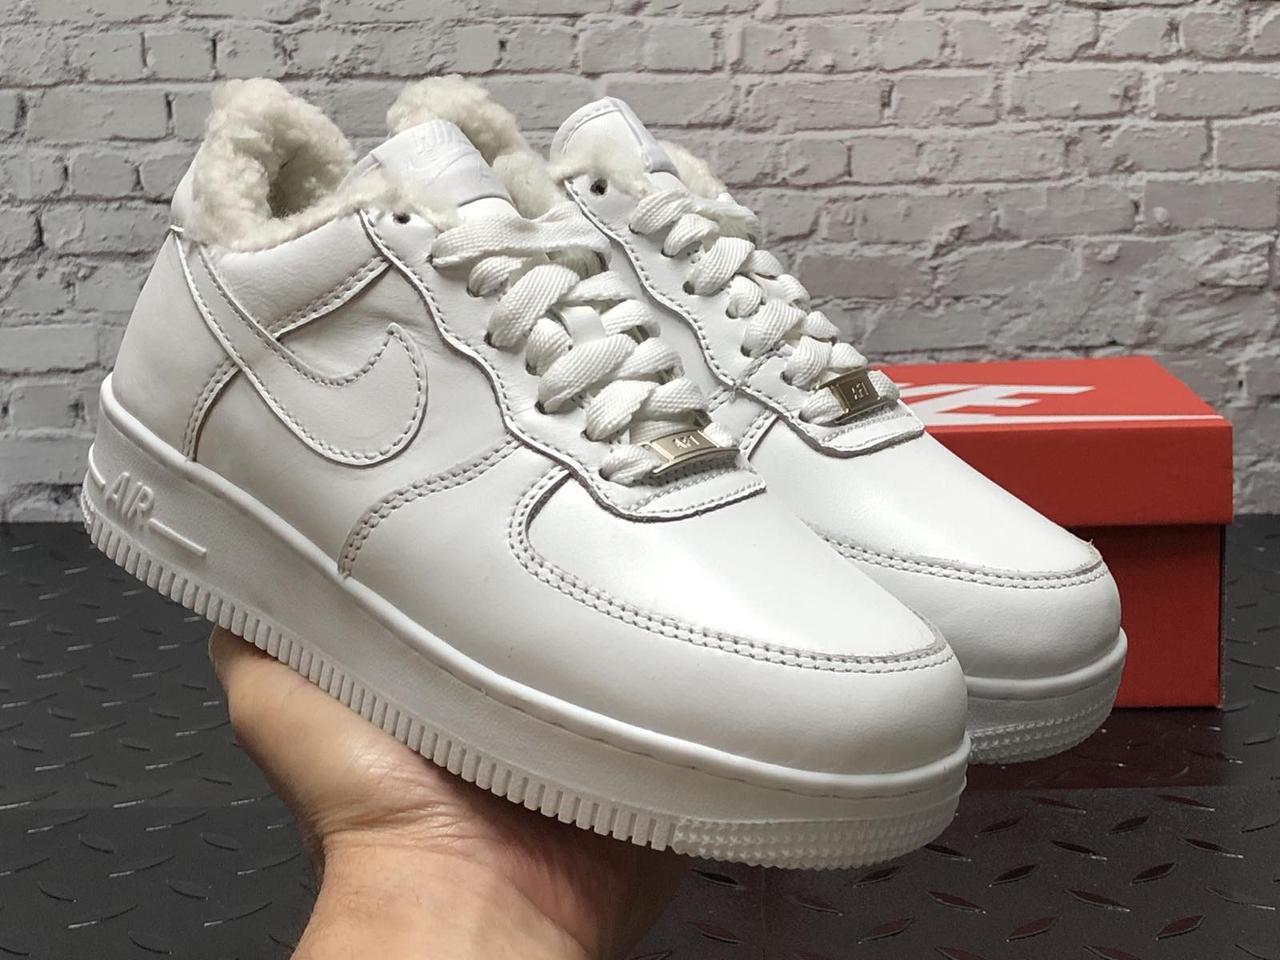 Зимние мужские кроссовки Nike Air Force white с мехом. ТОП Реплика ААА класса.